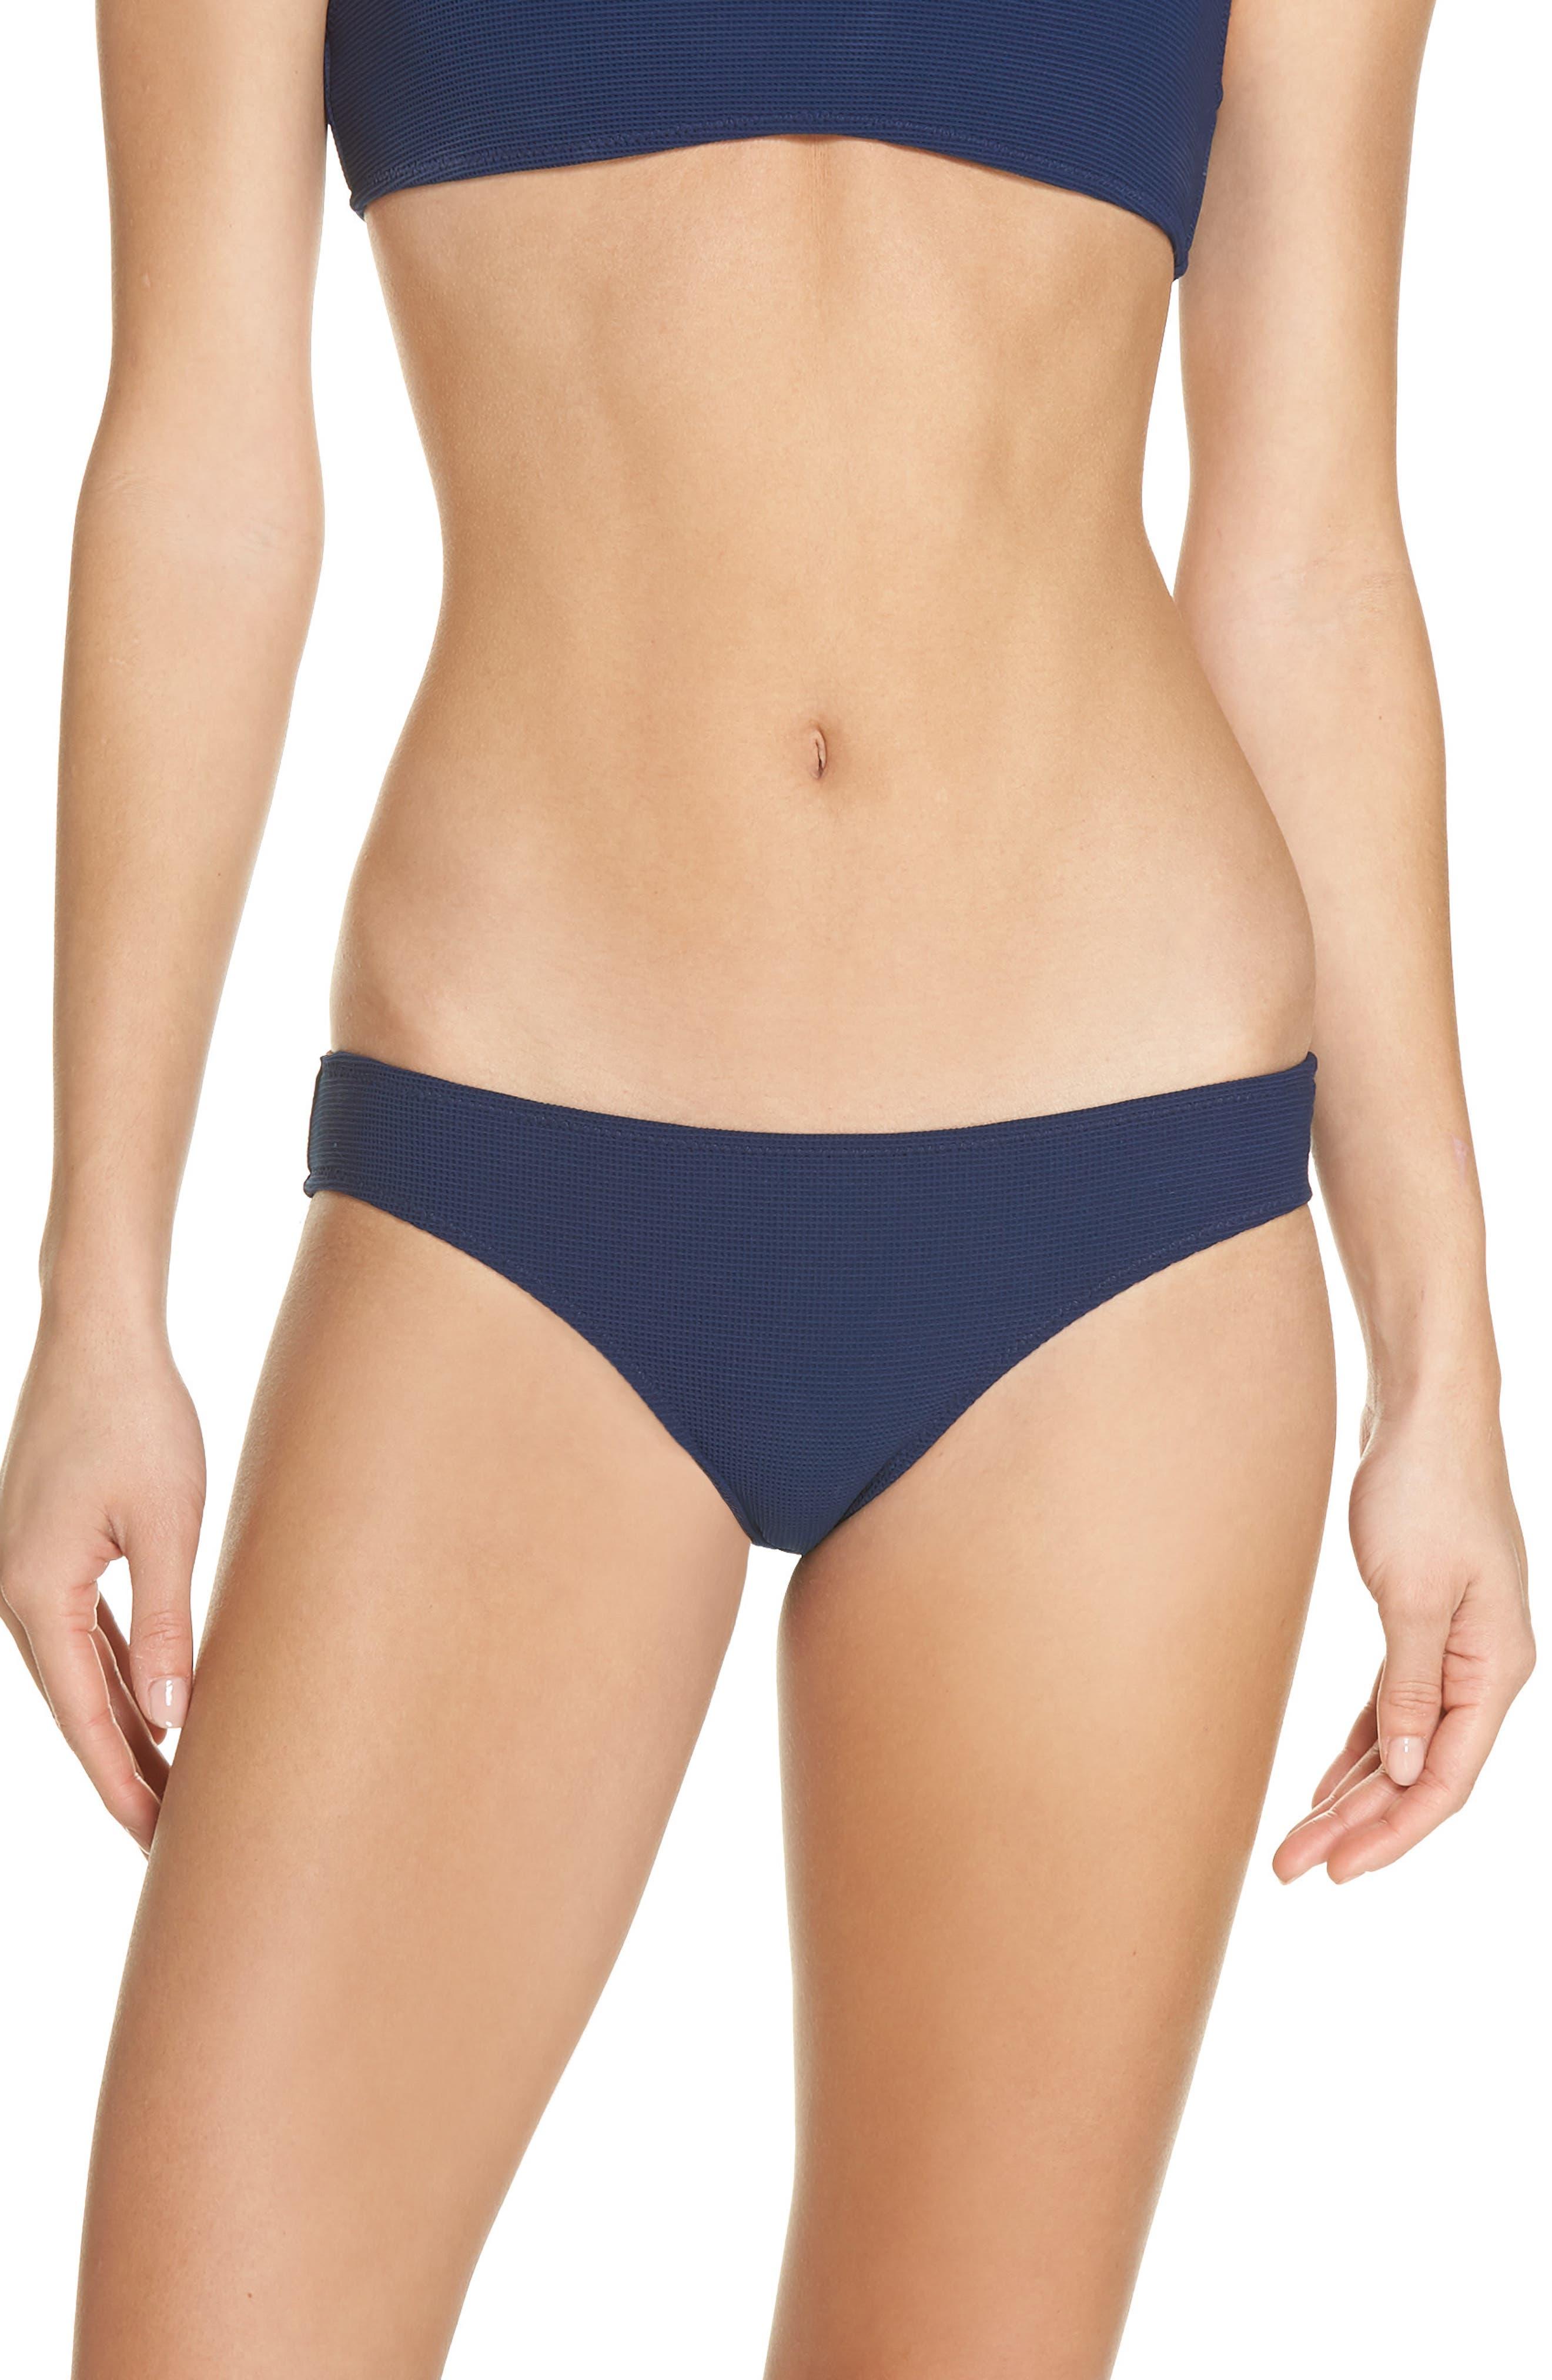 Elle Bikini Bottoms,                             Main thumbnail 1, color,                             415